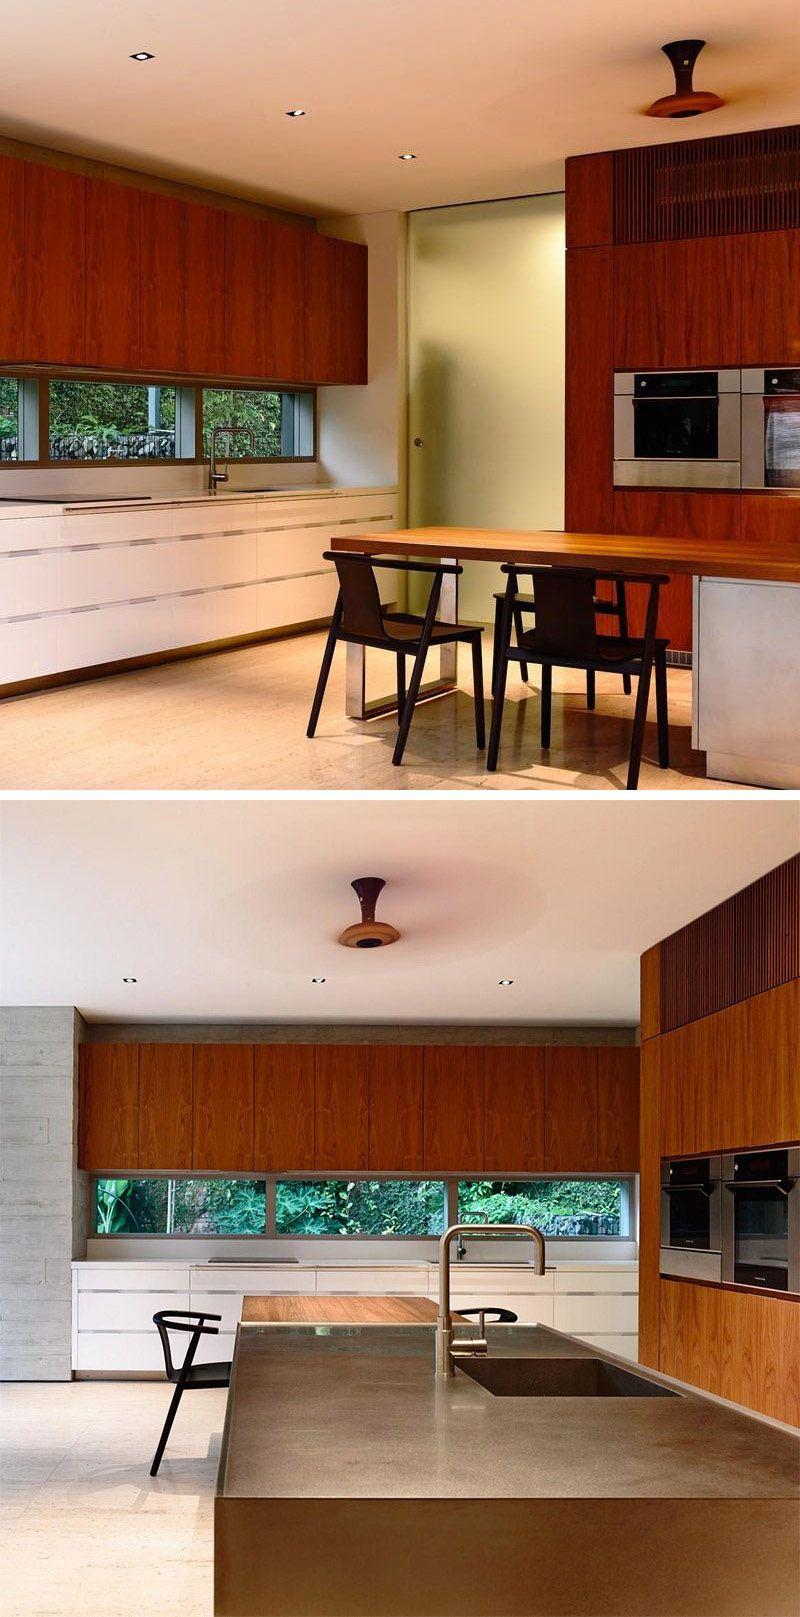 Interior Design Ideas Hide The AirConditioning Unit